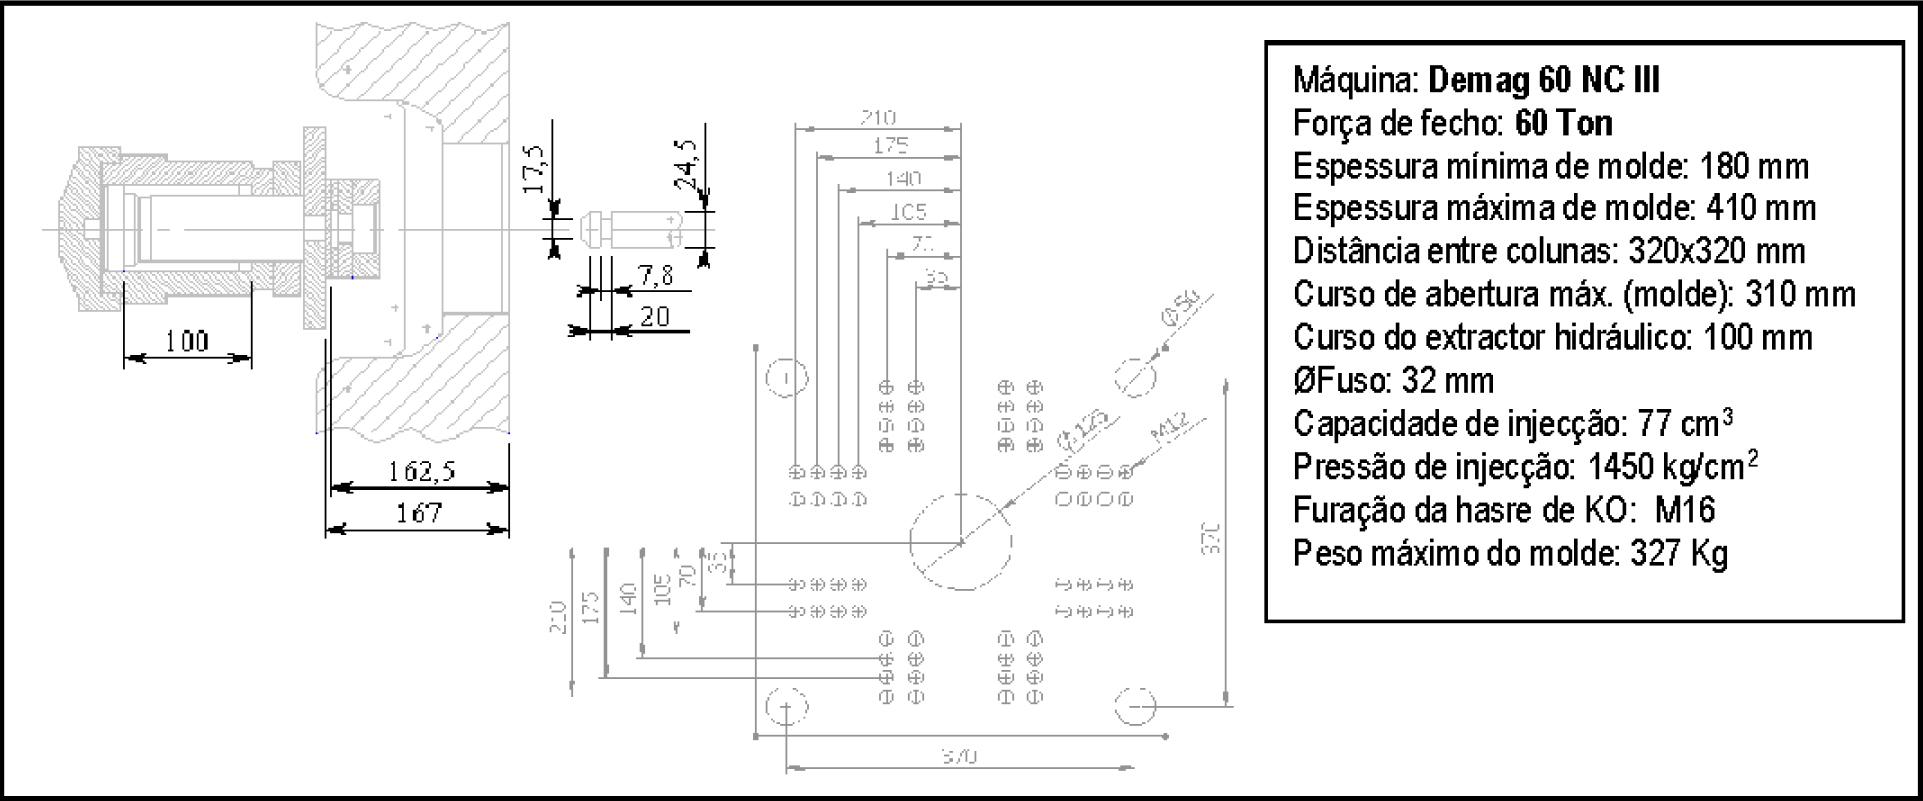 Smartinject 20 Ton Demag Wiring Diagram Equipament 60t